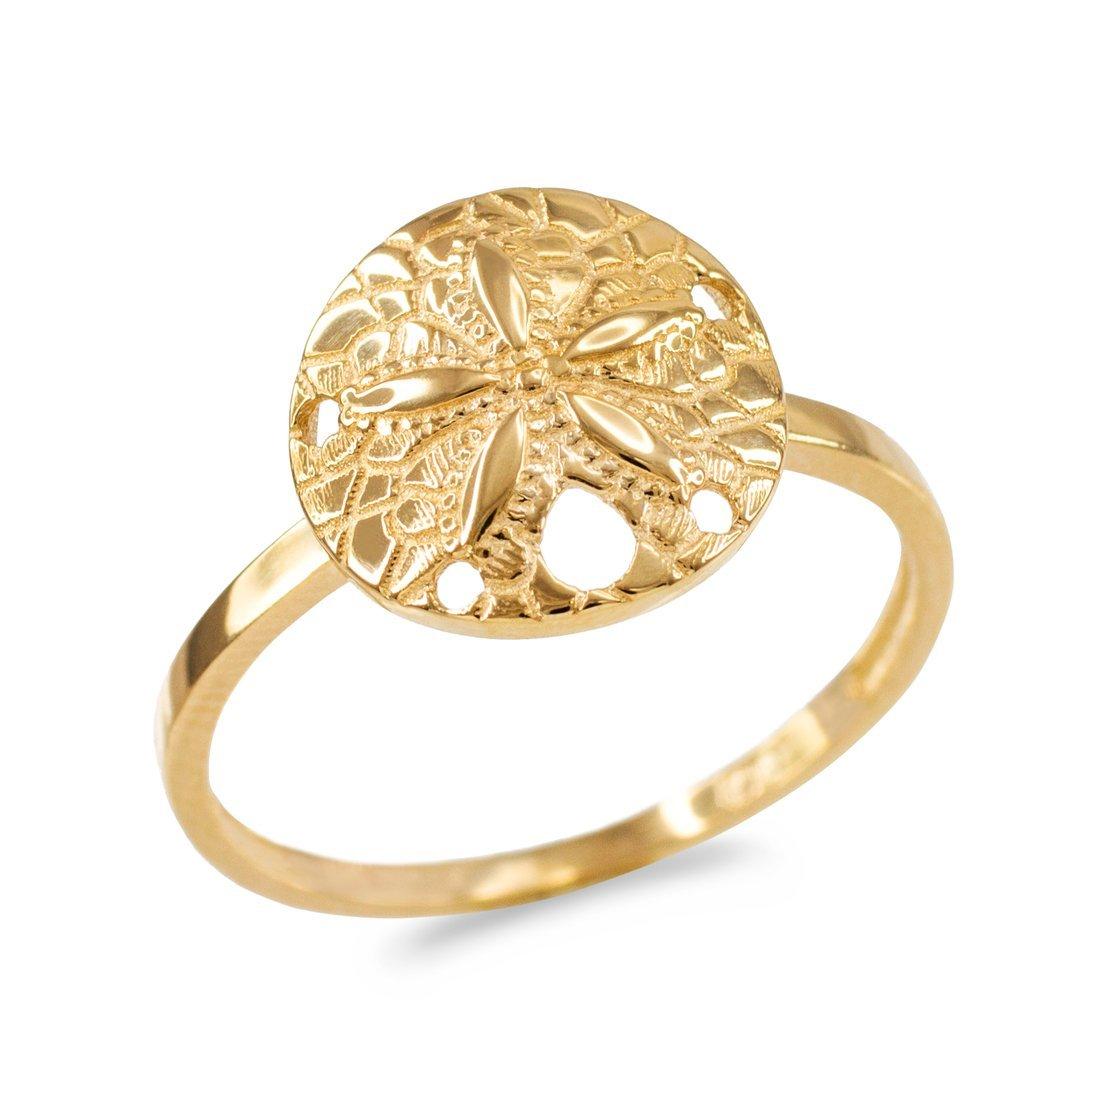 Dainty 10k Yellow Gold Sand Dollar Ladies Ring (Size 9)